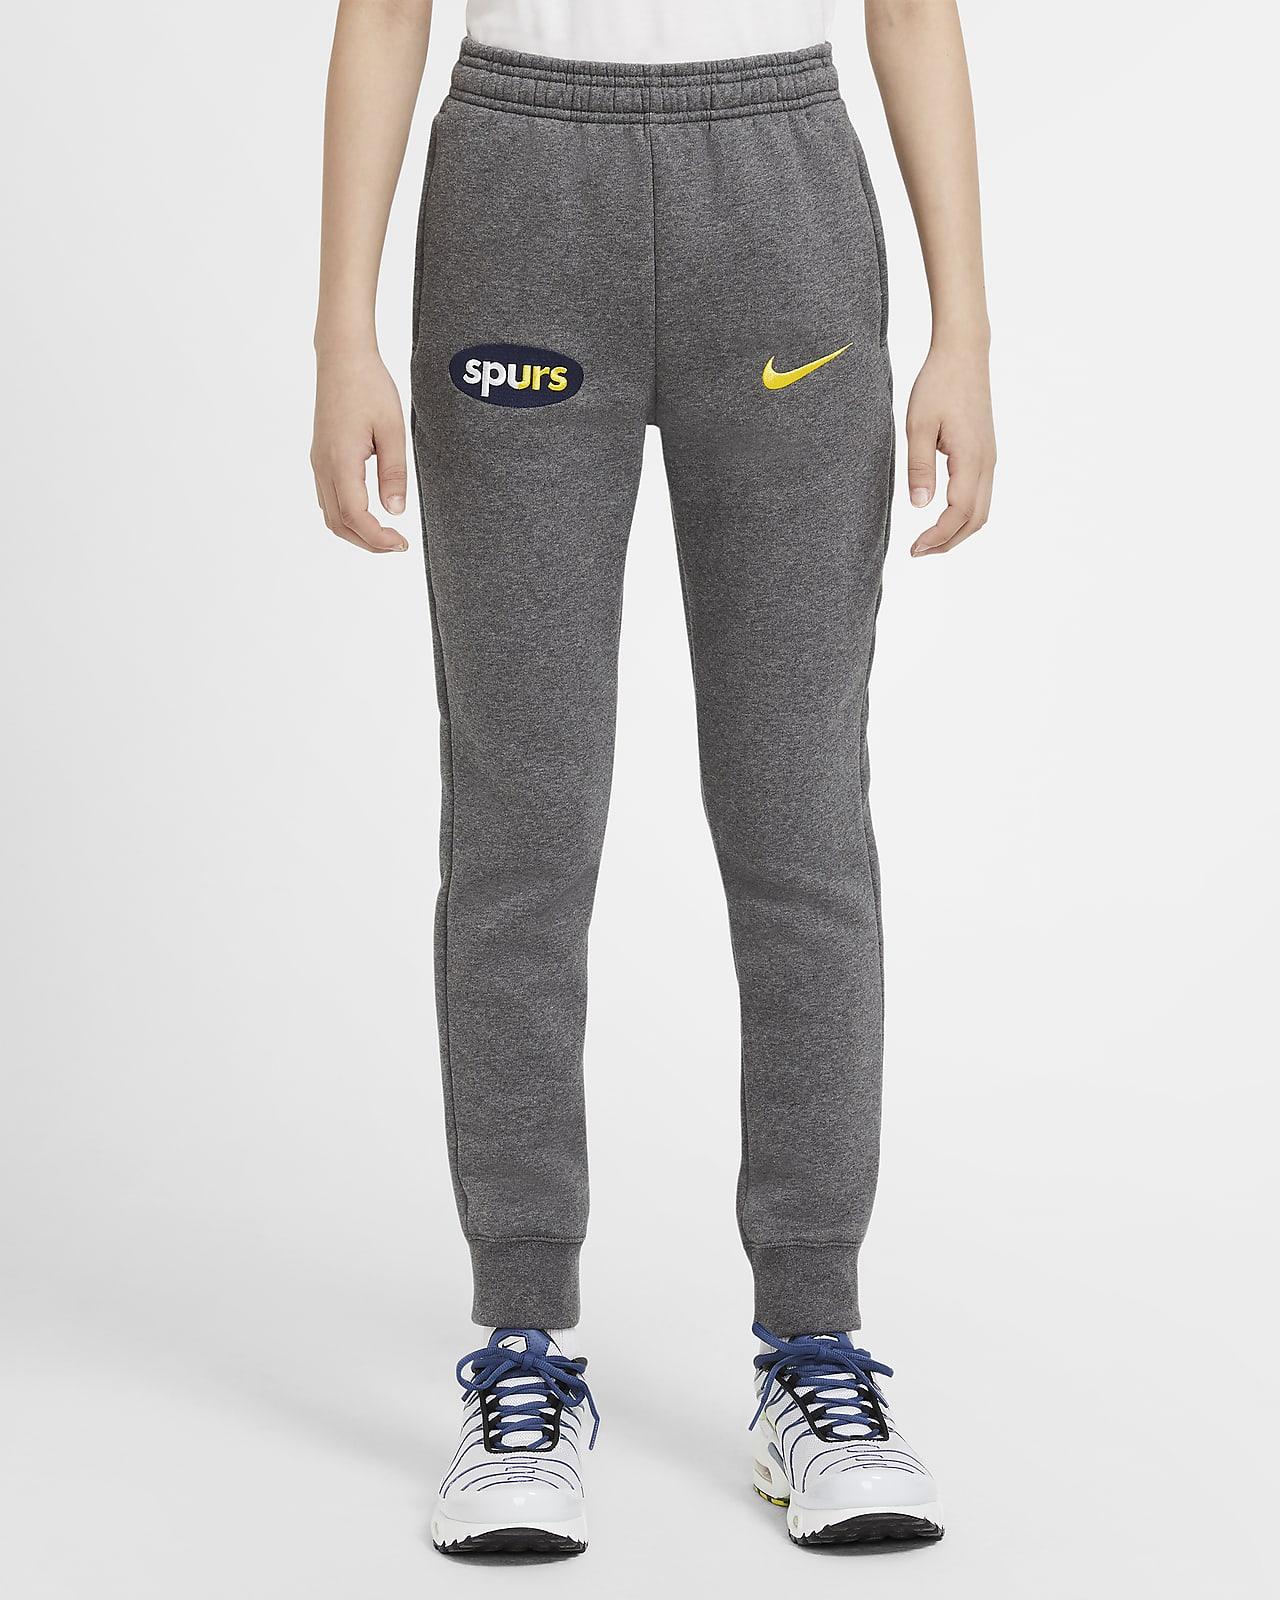 Pantaloni da calcio in fleece Tottenham Hotspur - Ragazzi